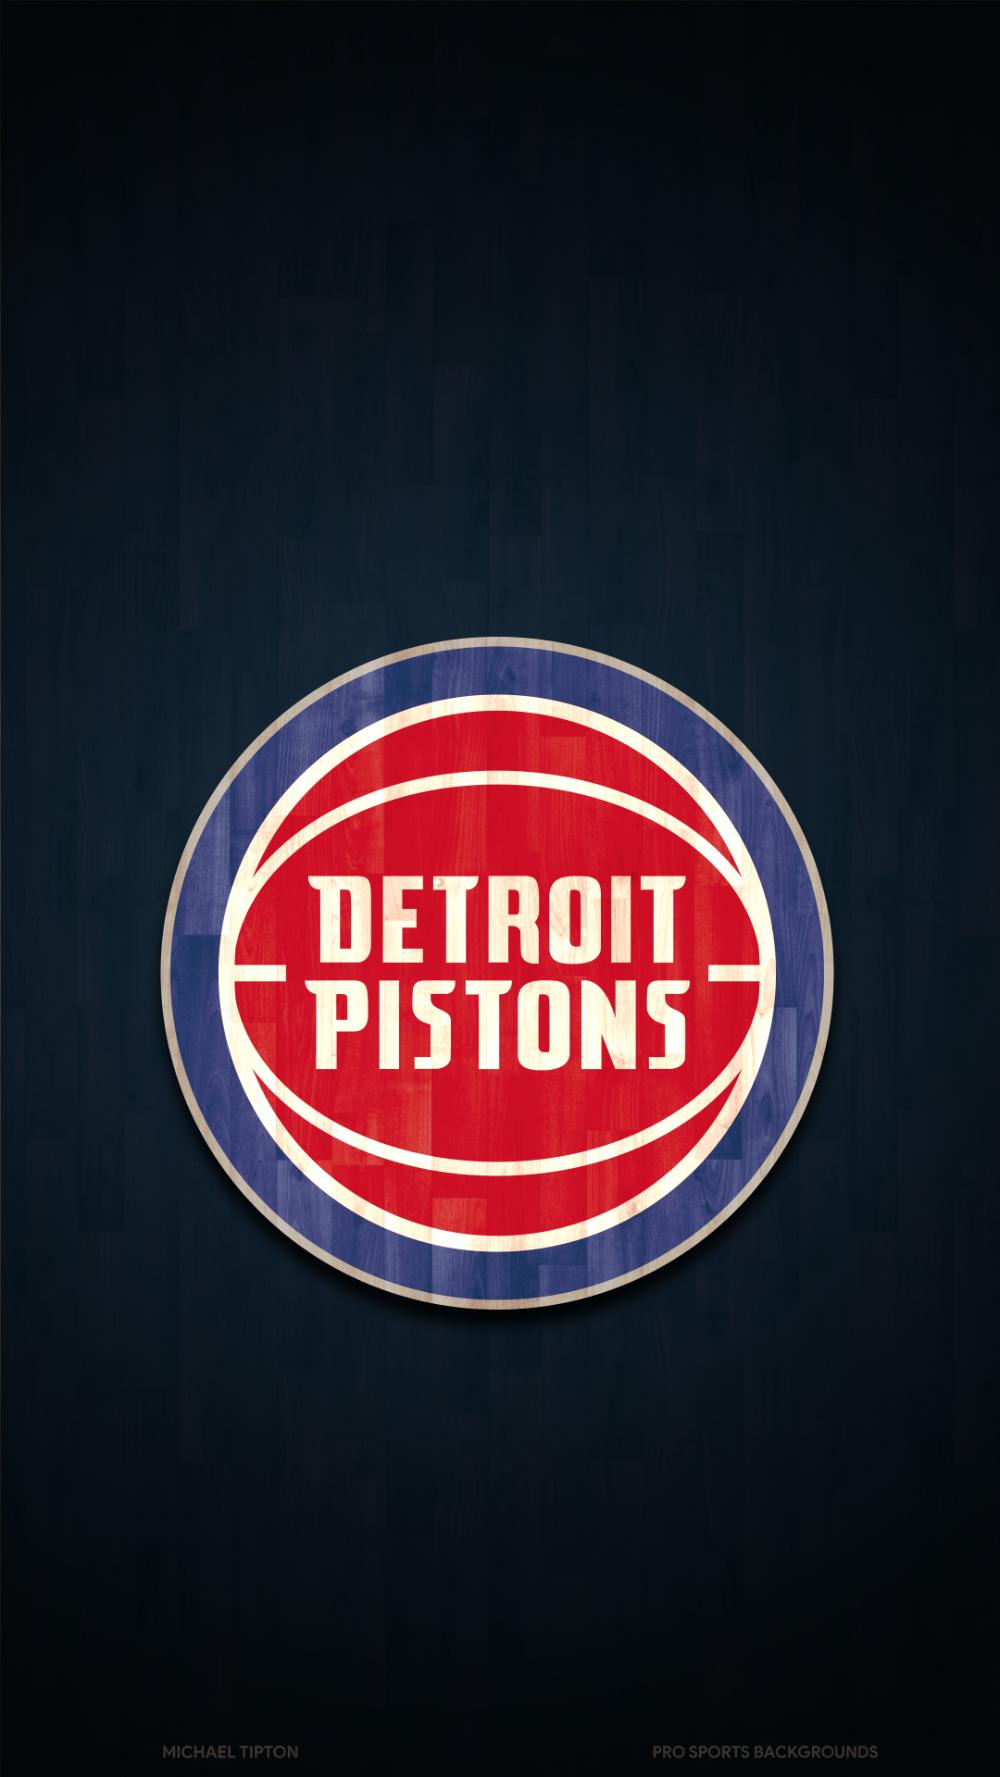 Detroit Pistons Wallpapers Detroit pistons, Detroit, Pistons